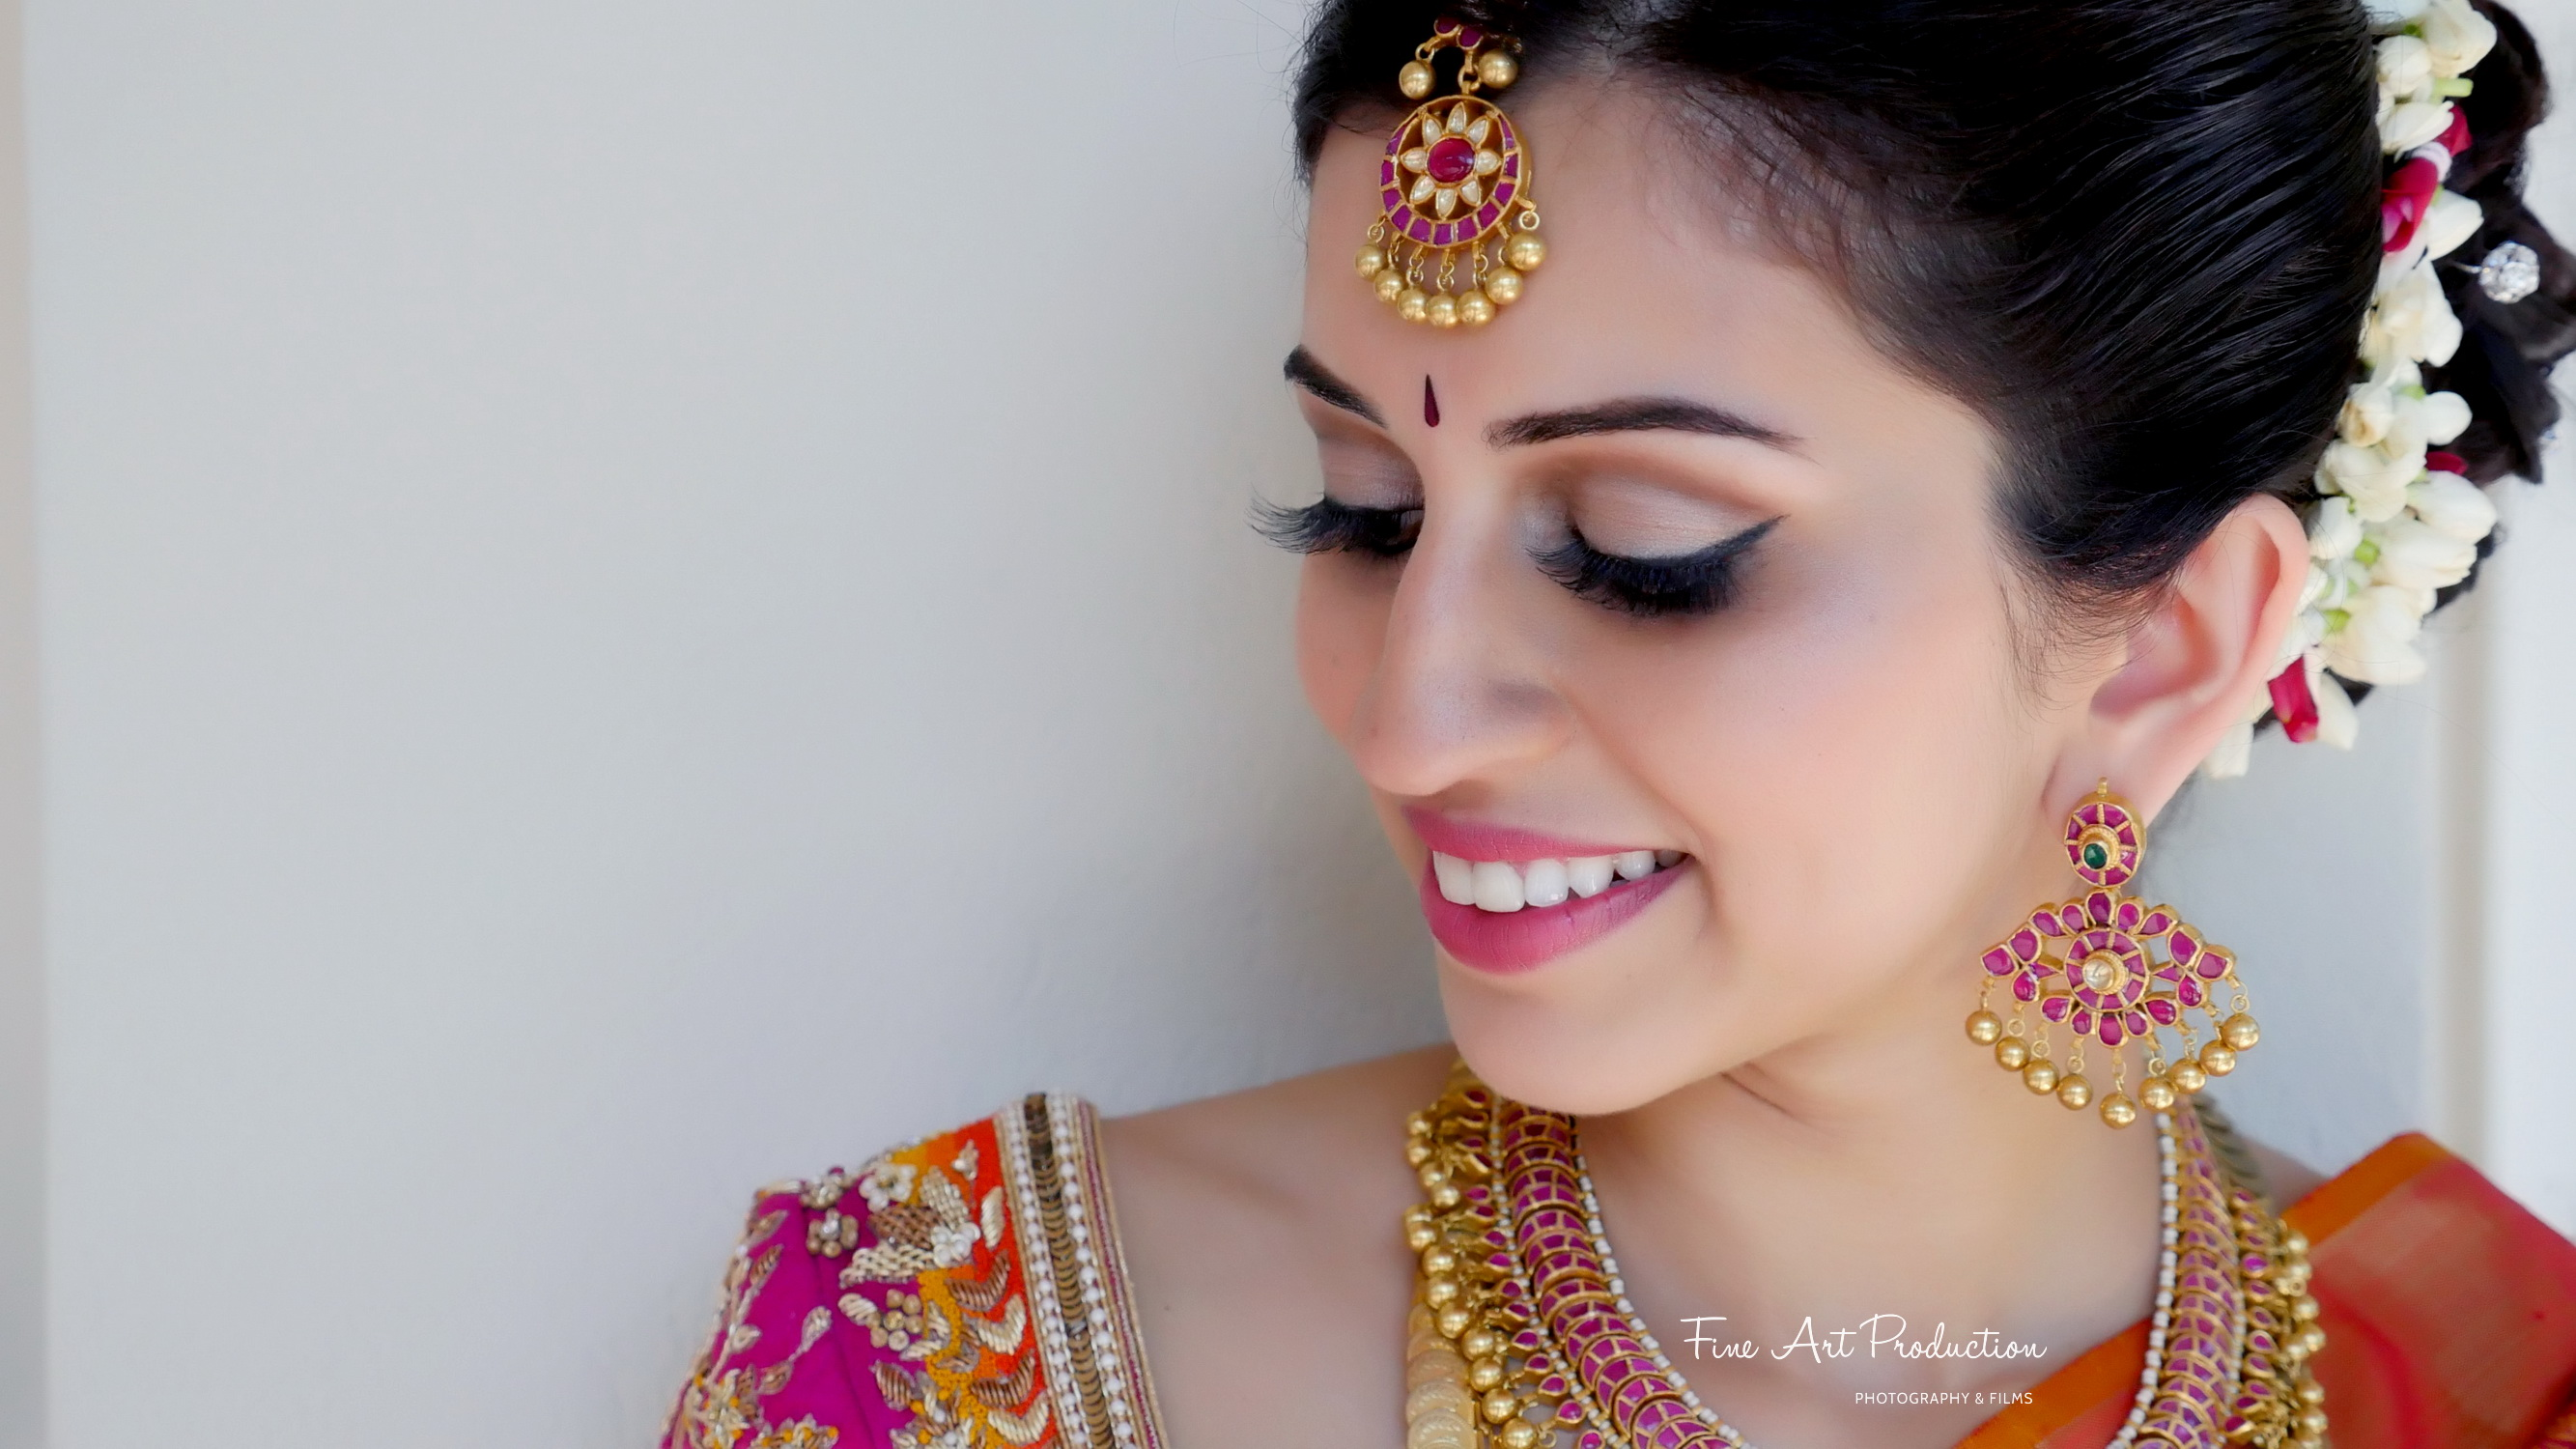 india-wedding-photographer-fine-art-production-chirali-amish-thakkar_0008